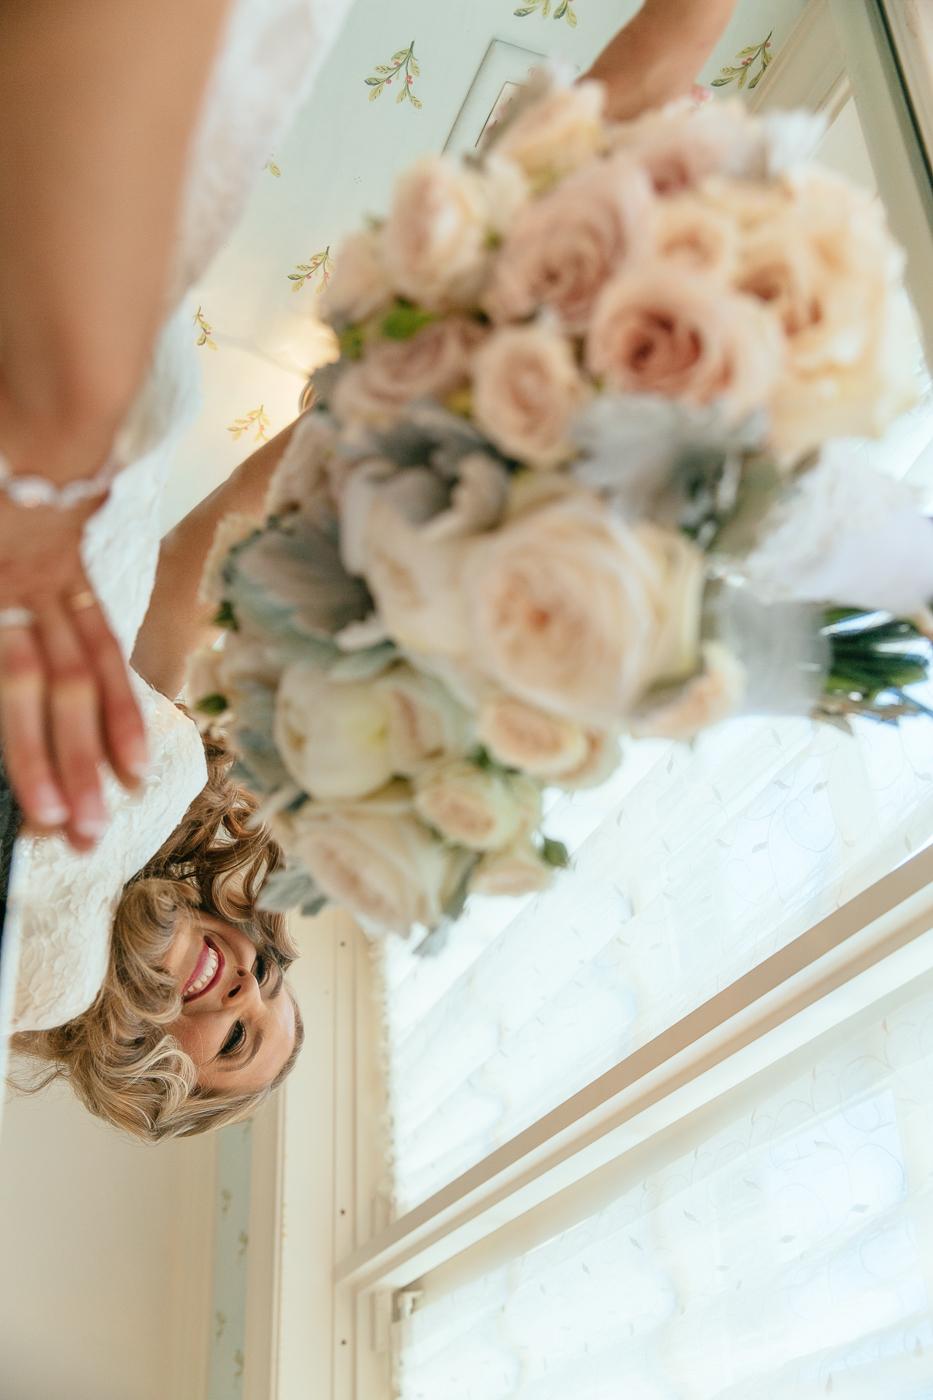 RYAN_&_KELLEY_DARLINGTON_HOUSE_WEDDING_2014_7X9A1770.JPG